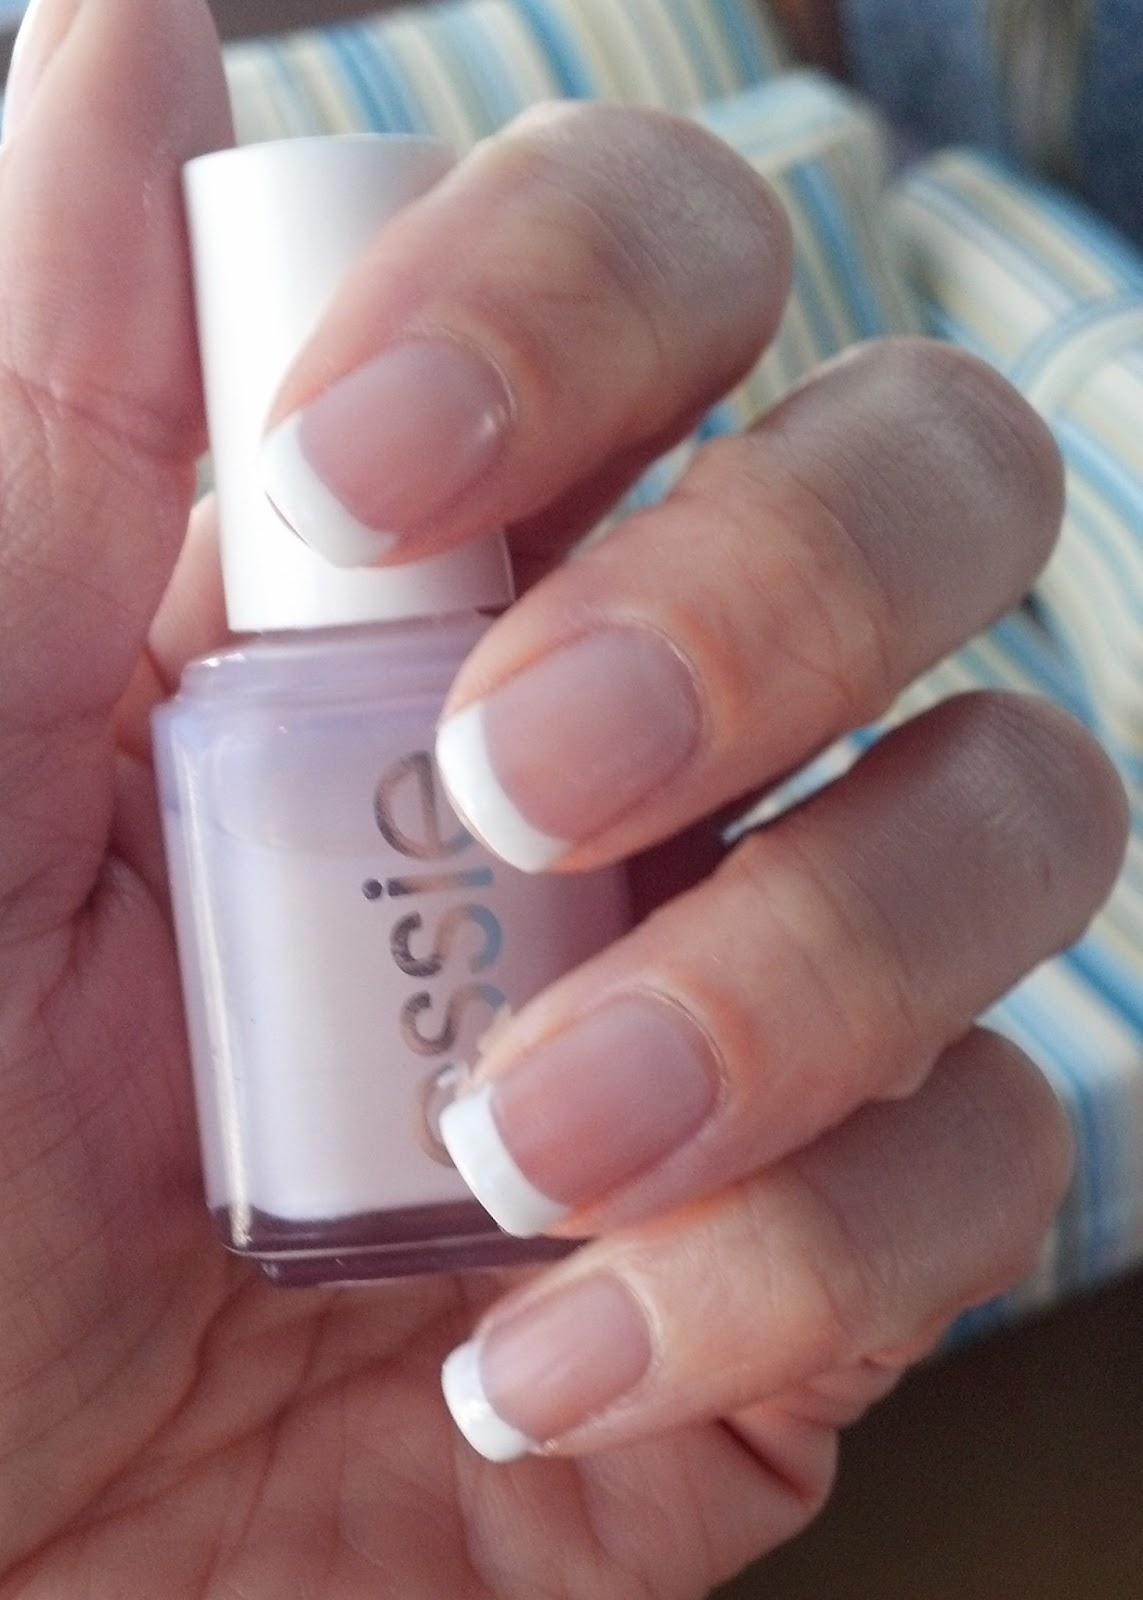 PraiseTheGlaze: French Manicure with Essie Beam Up & OPI Alpine Snow